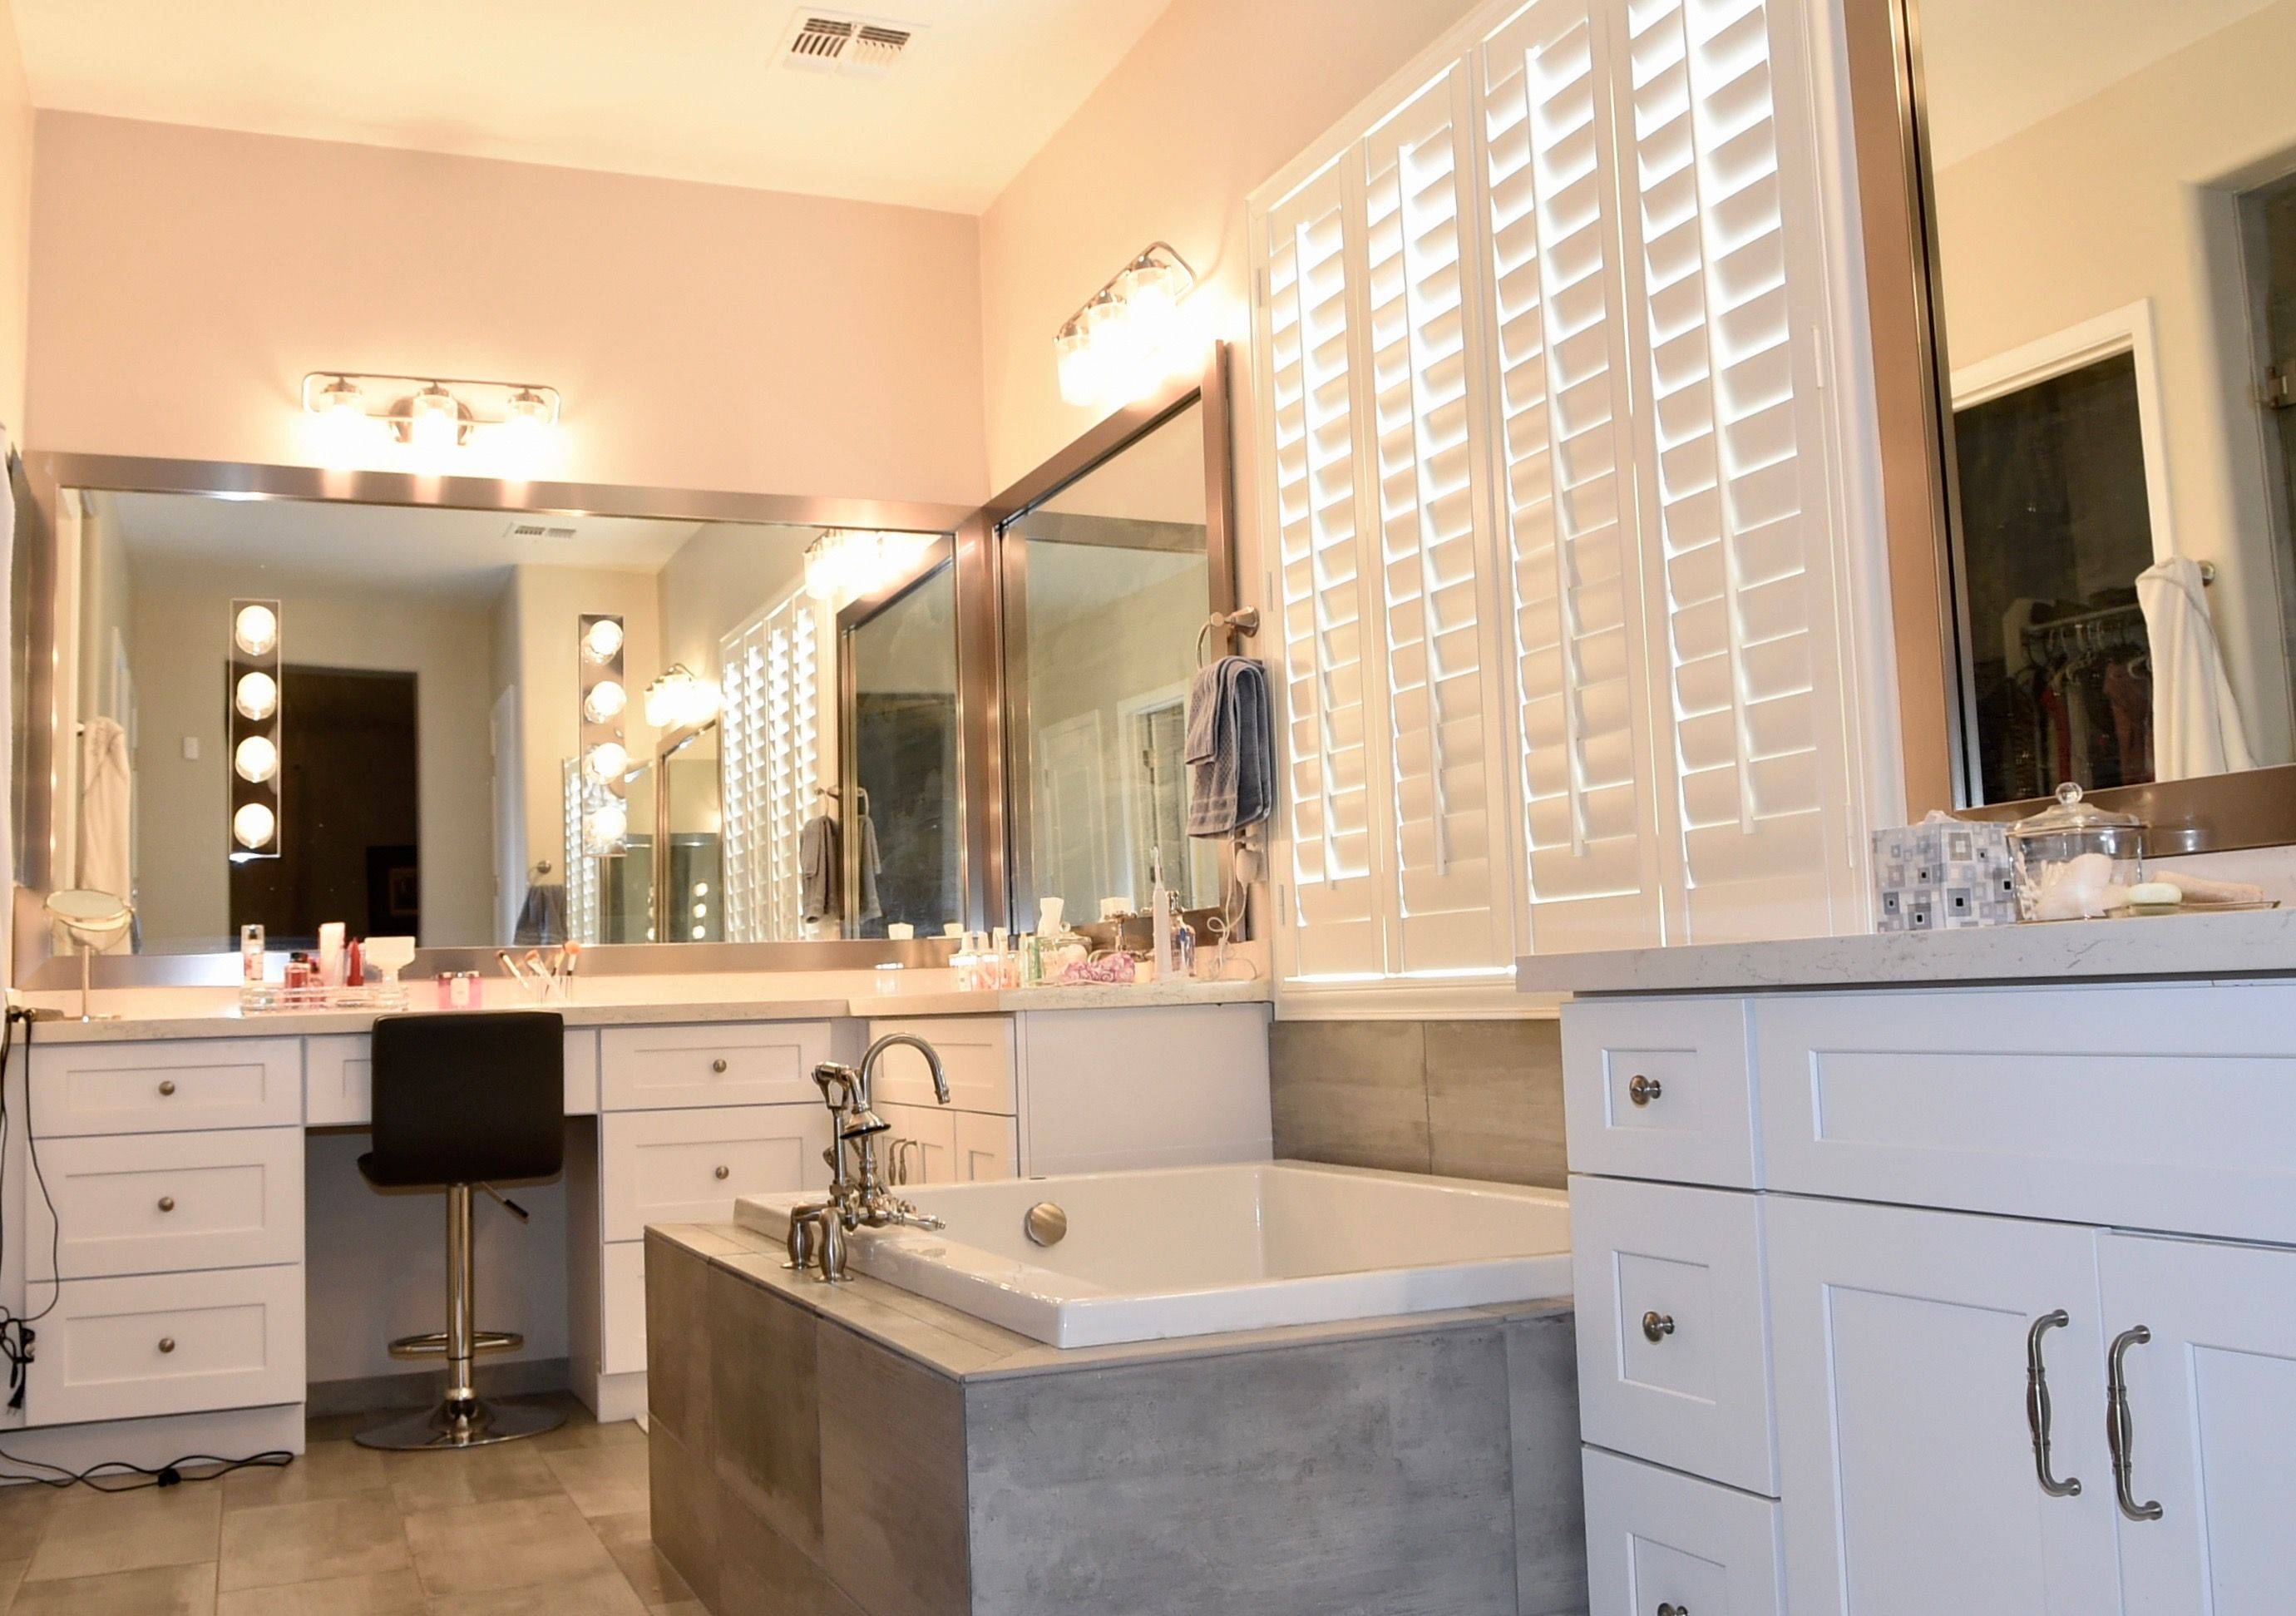 Master Bathroom Remodel Ideas In 2020 Bathroom Remodel Master Bathrooms Remodel Luxury Remodel